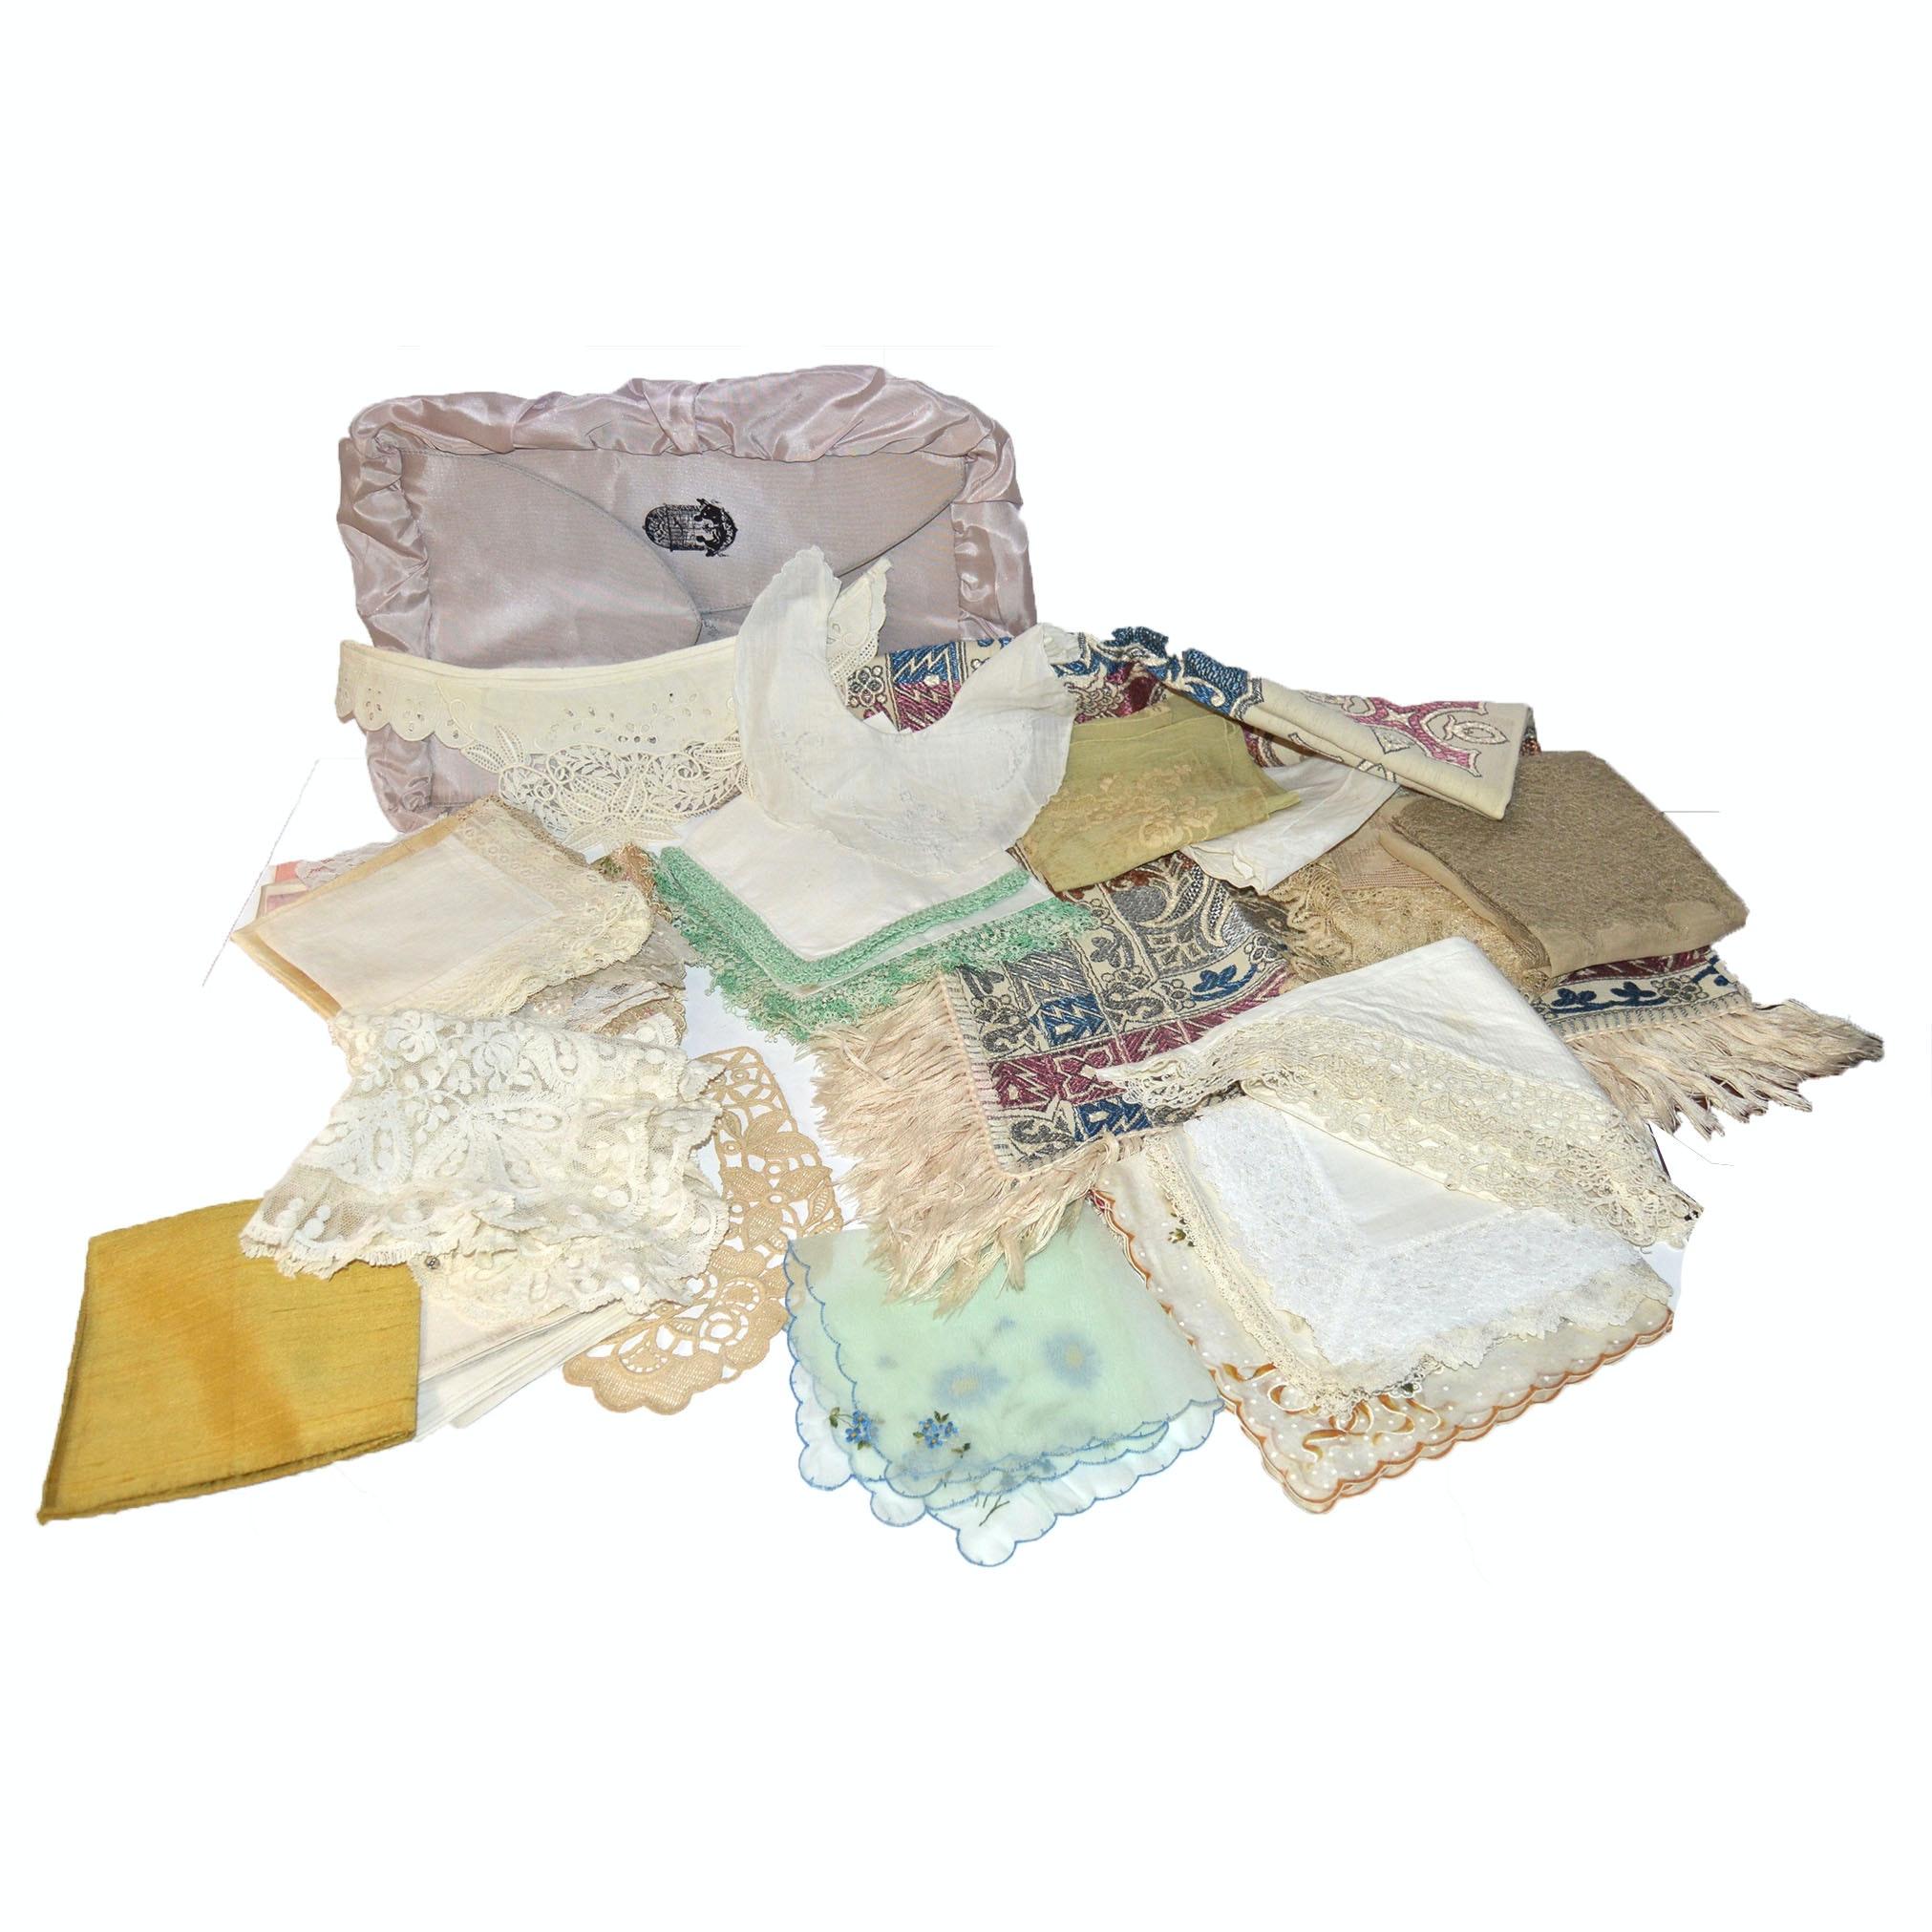 Vintage Handkerchiefs and Linens